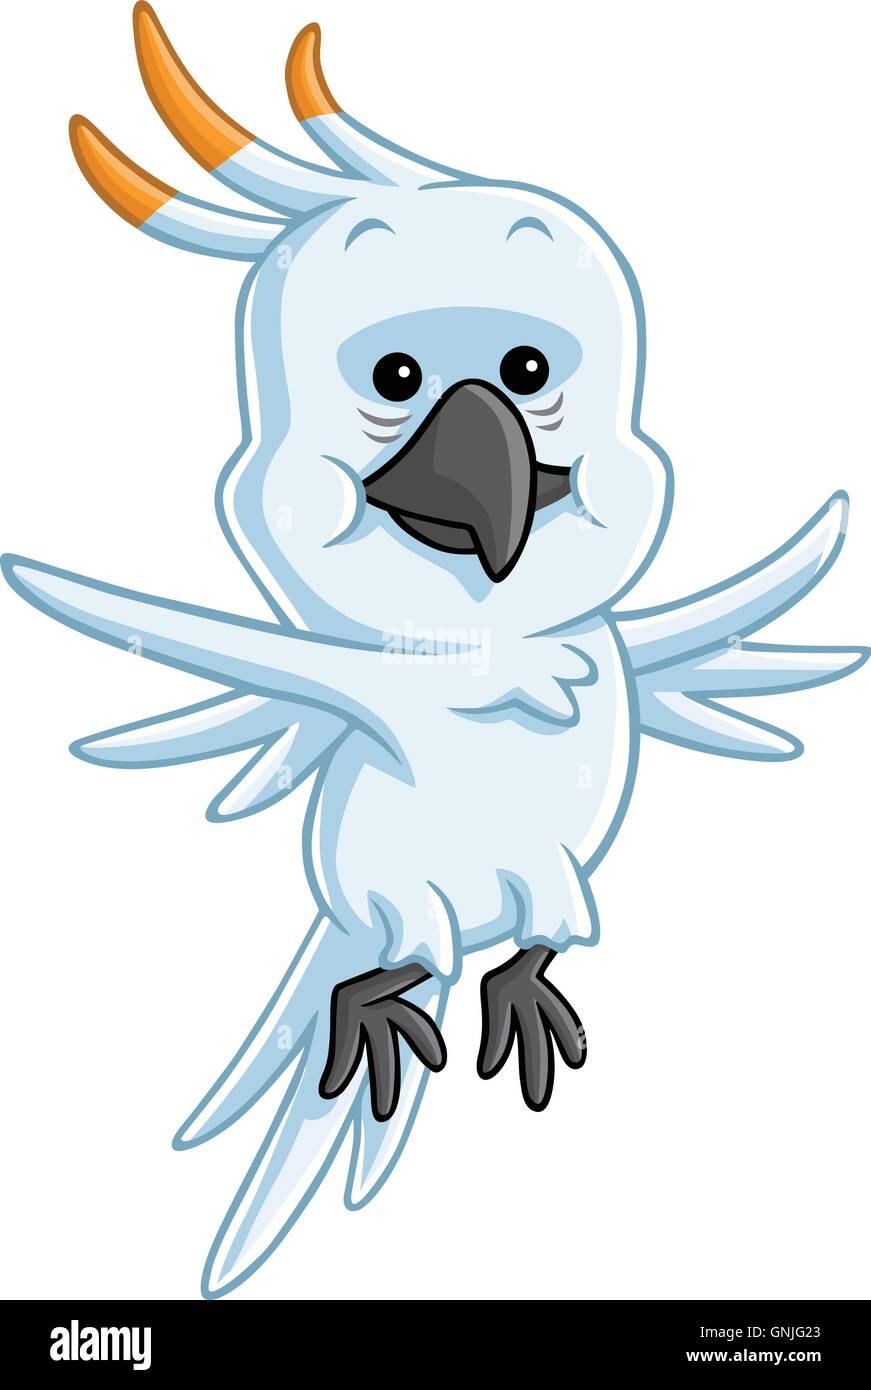 Cockatoo Cartoon Vector - Stock Vector